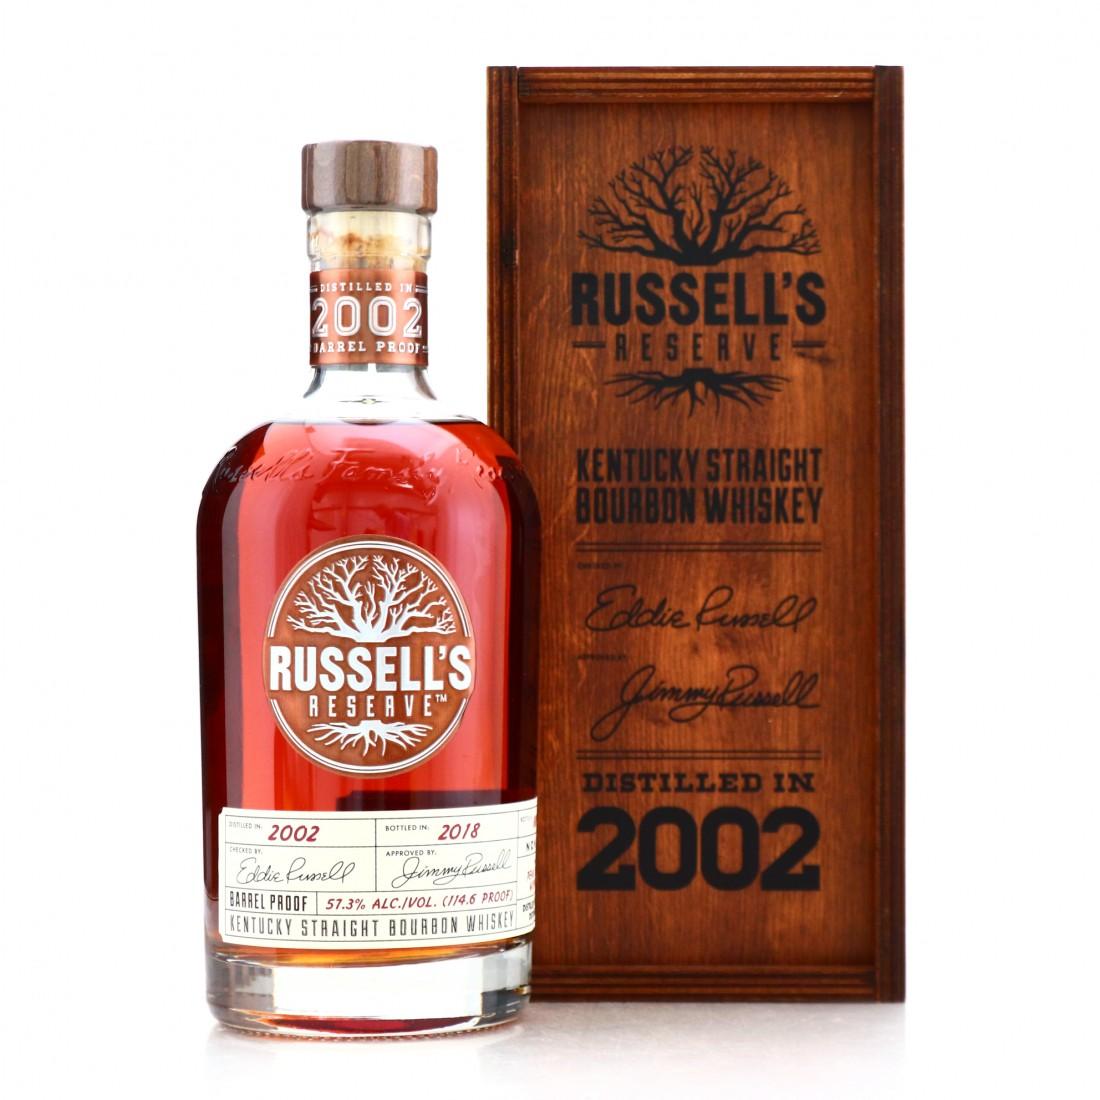 Russell's Reserve 2002 Barrel Proof Kentucky Straight Bourbon